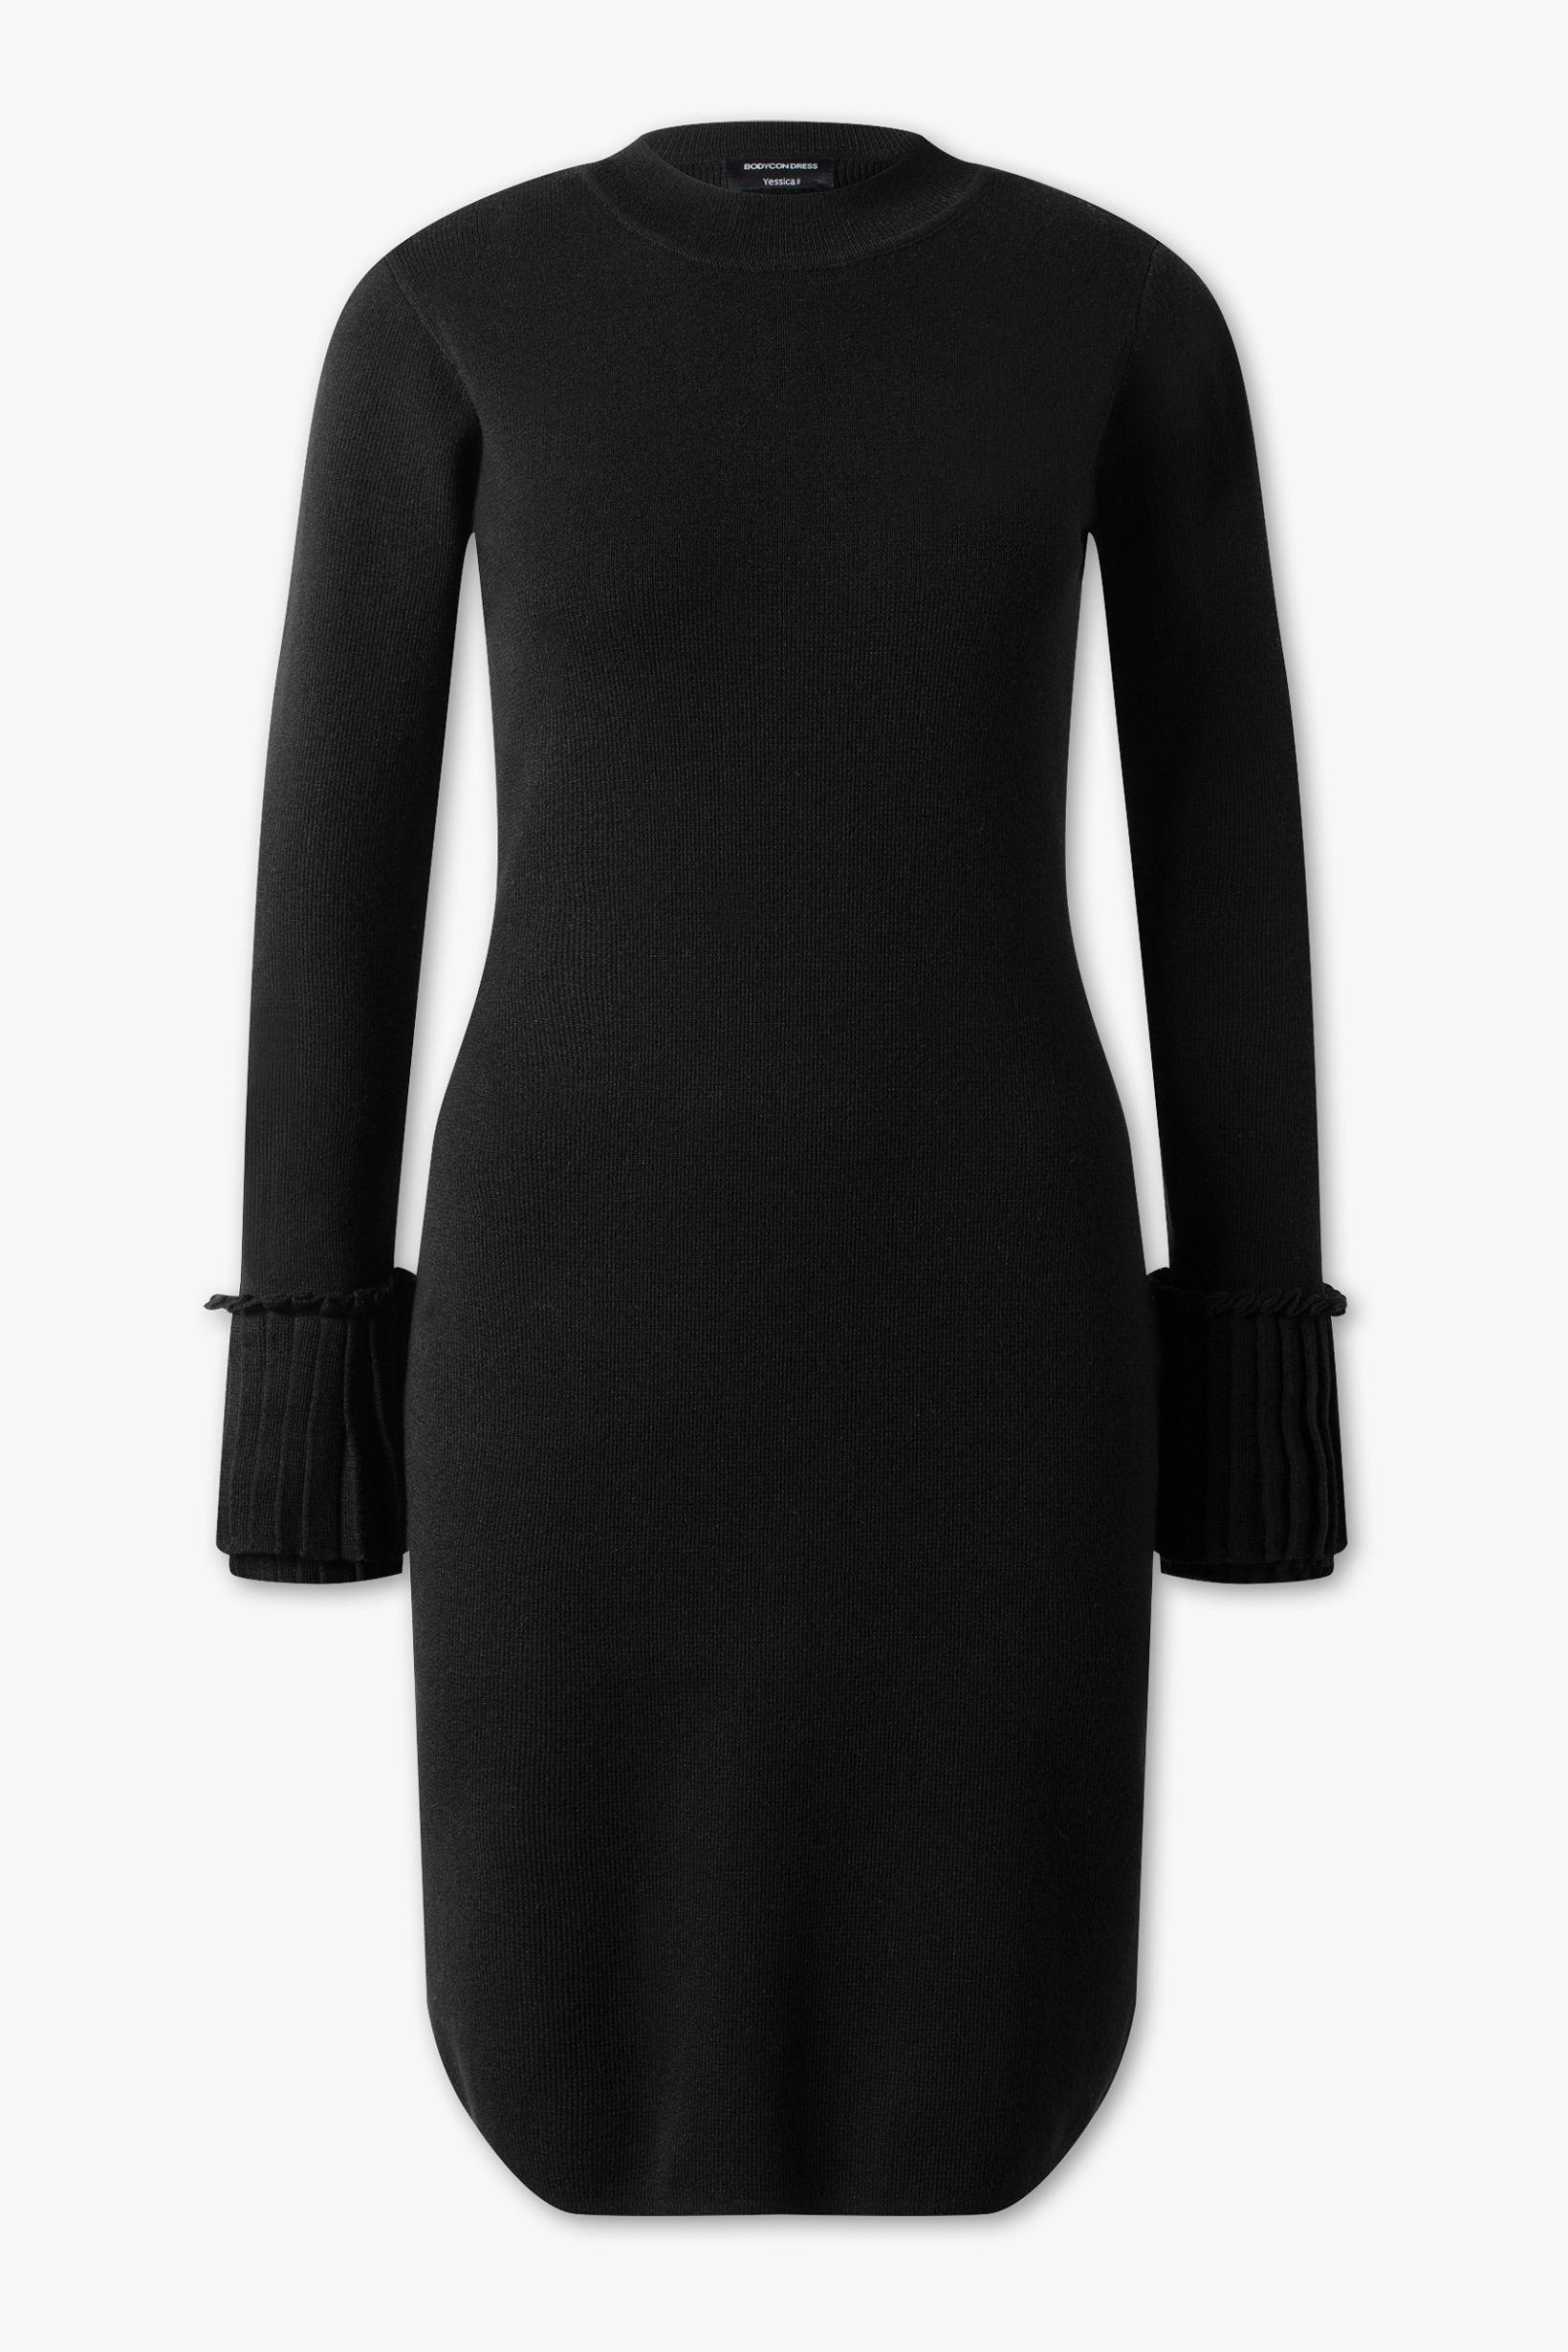 Gebreide jurk c&a